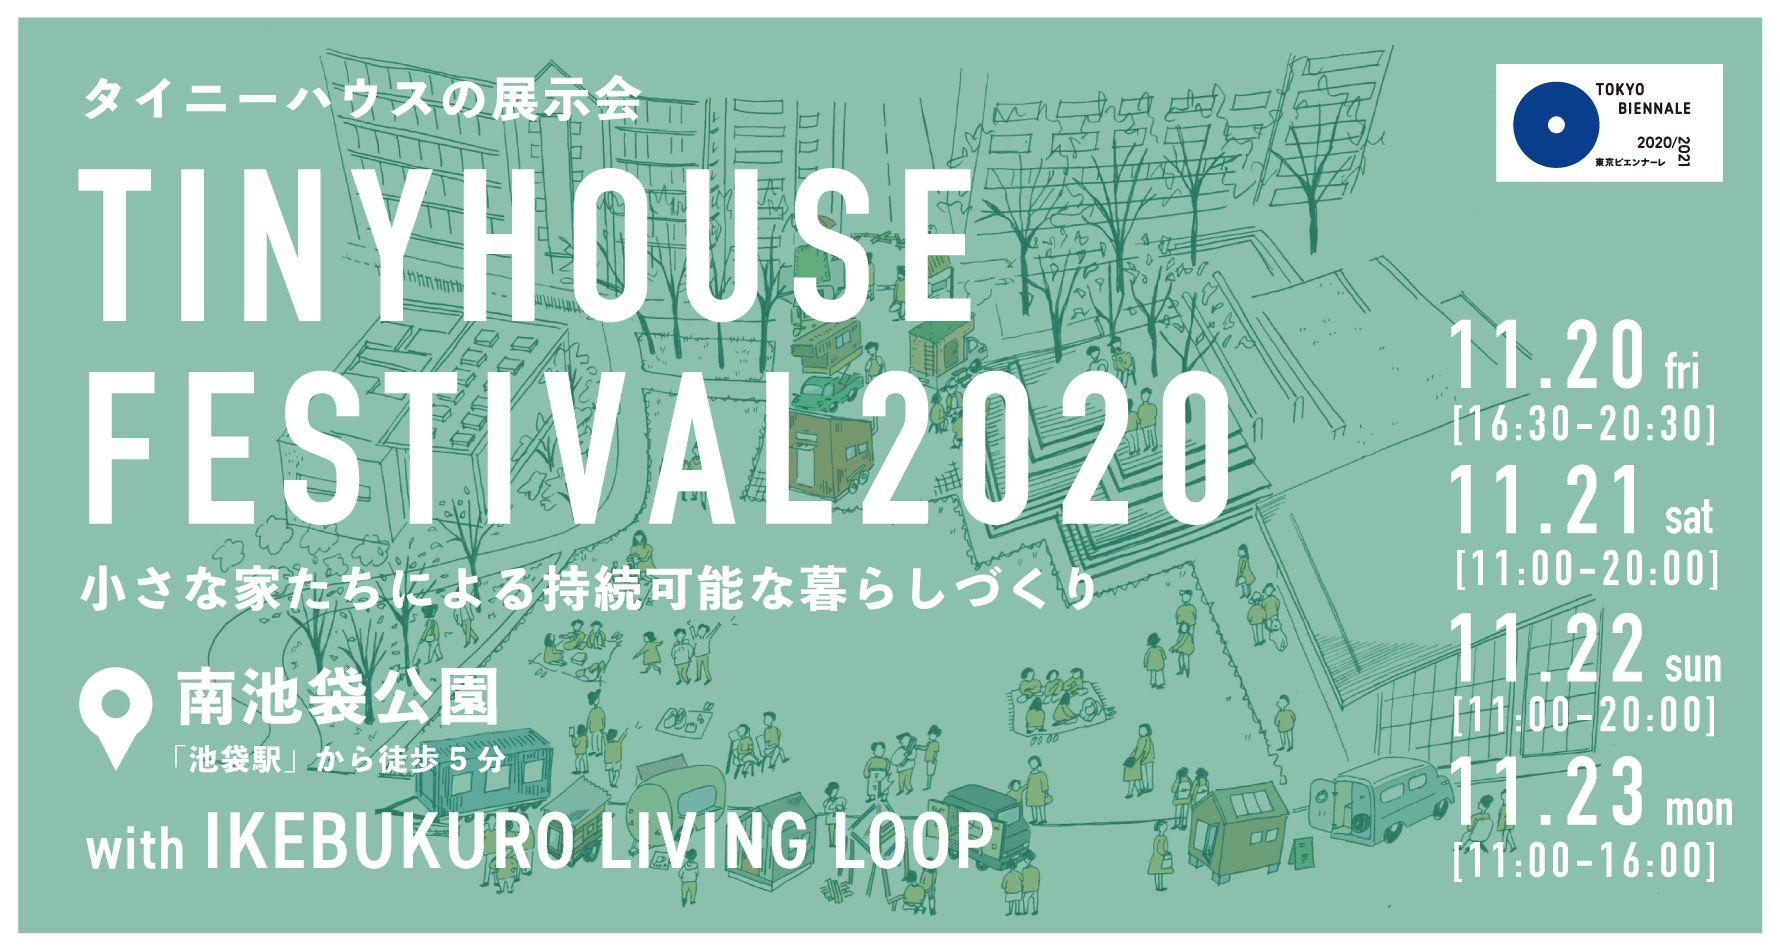 TINY HOUSE FESTIVAL 2020